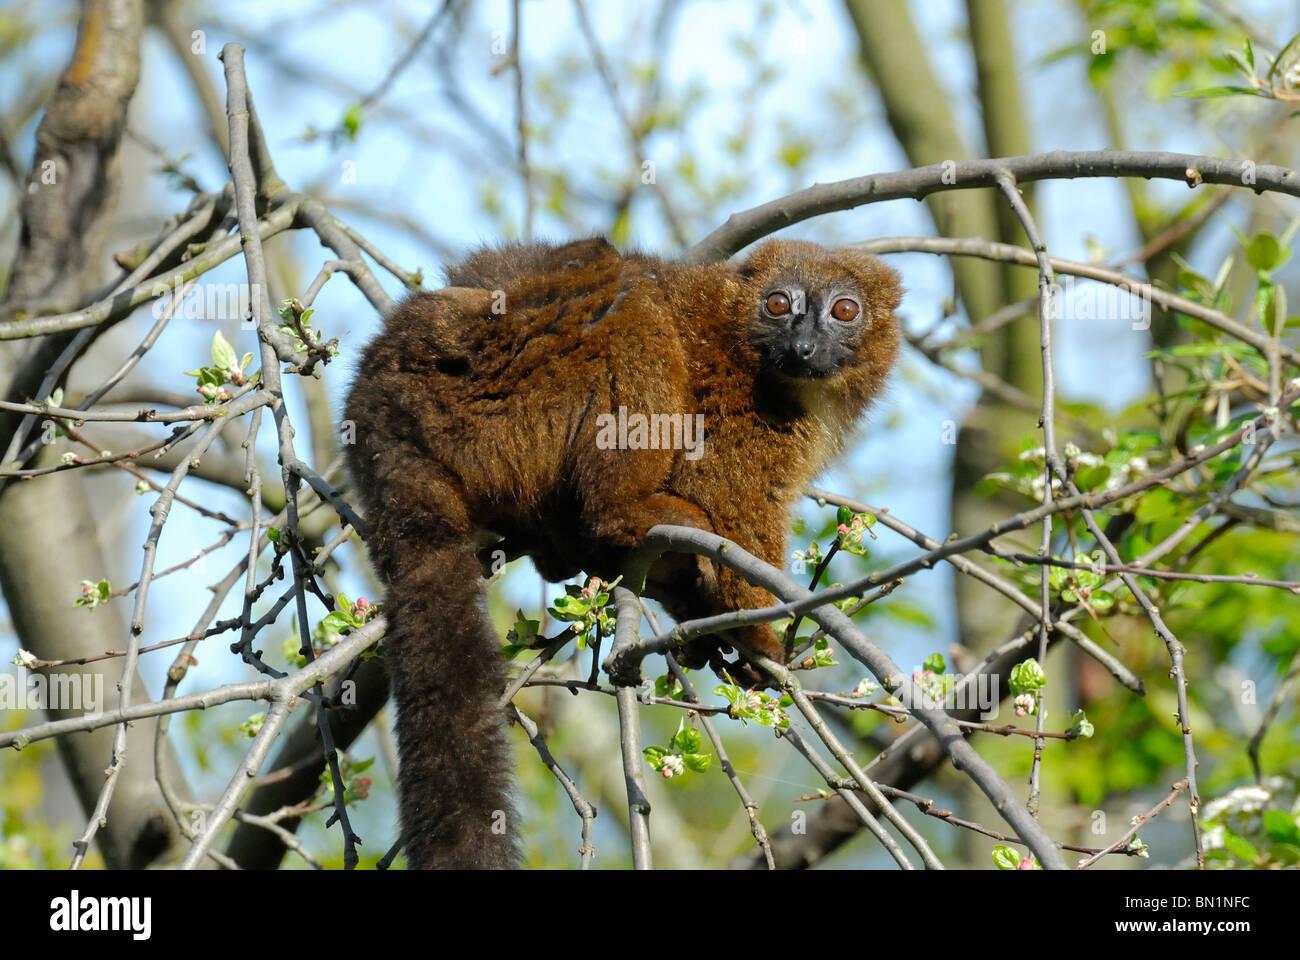 Lemur - Stock Image